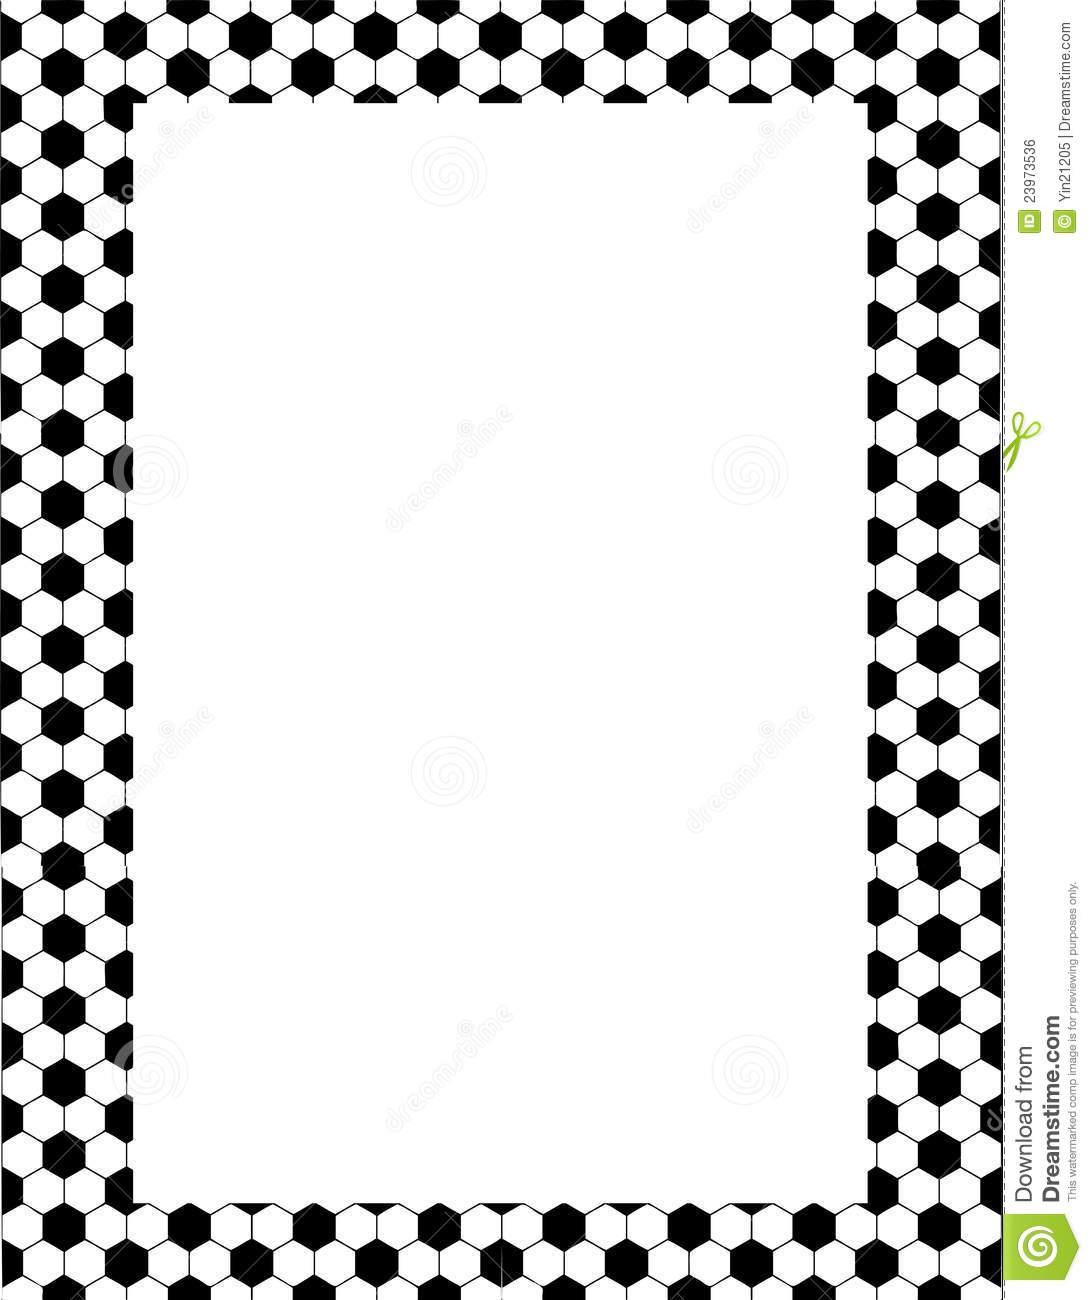 Football Border Clipart Panda